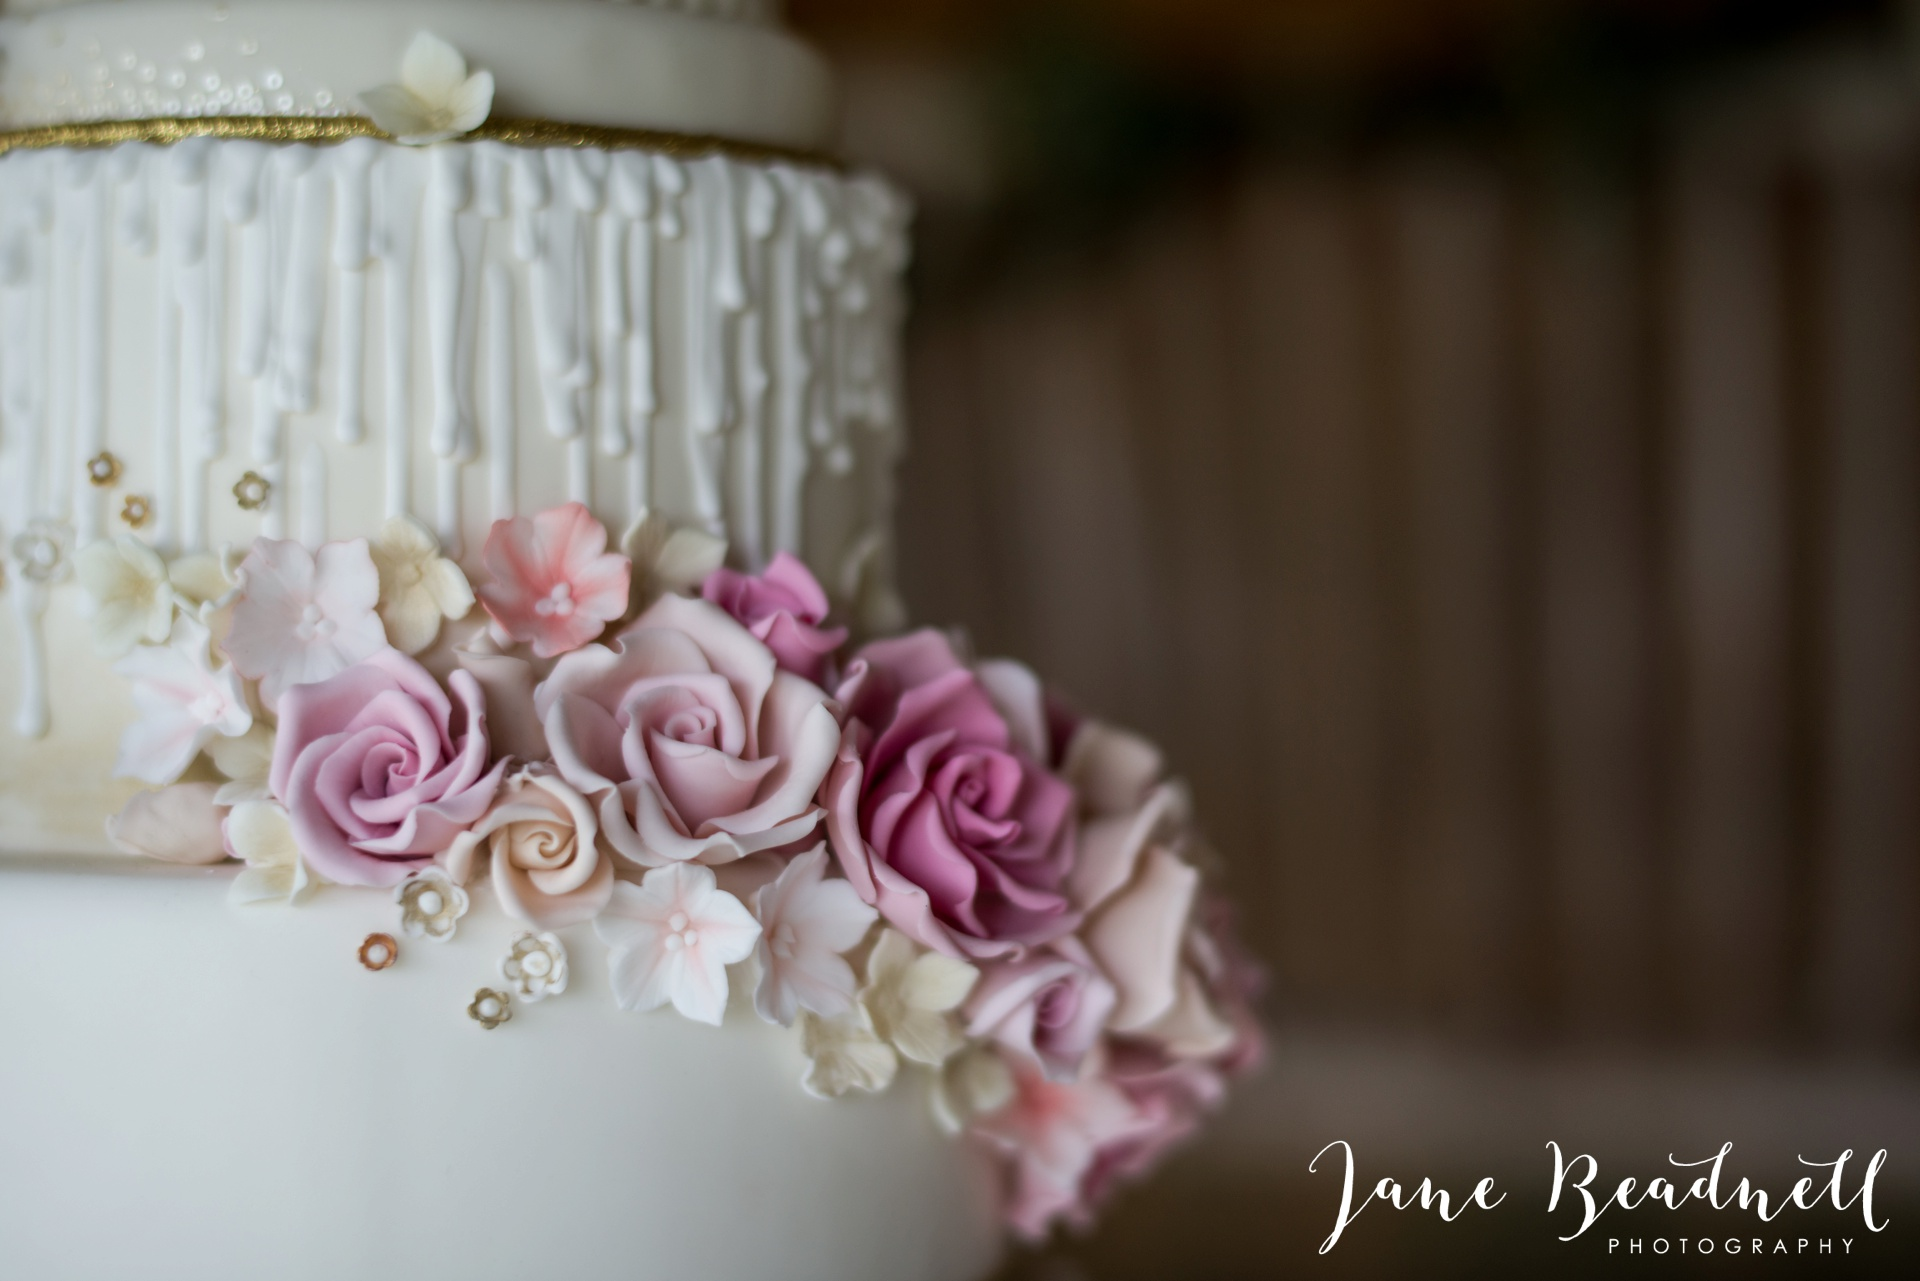 Jane Beadnell fine art wedding photographer Swinton Park4